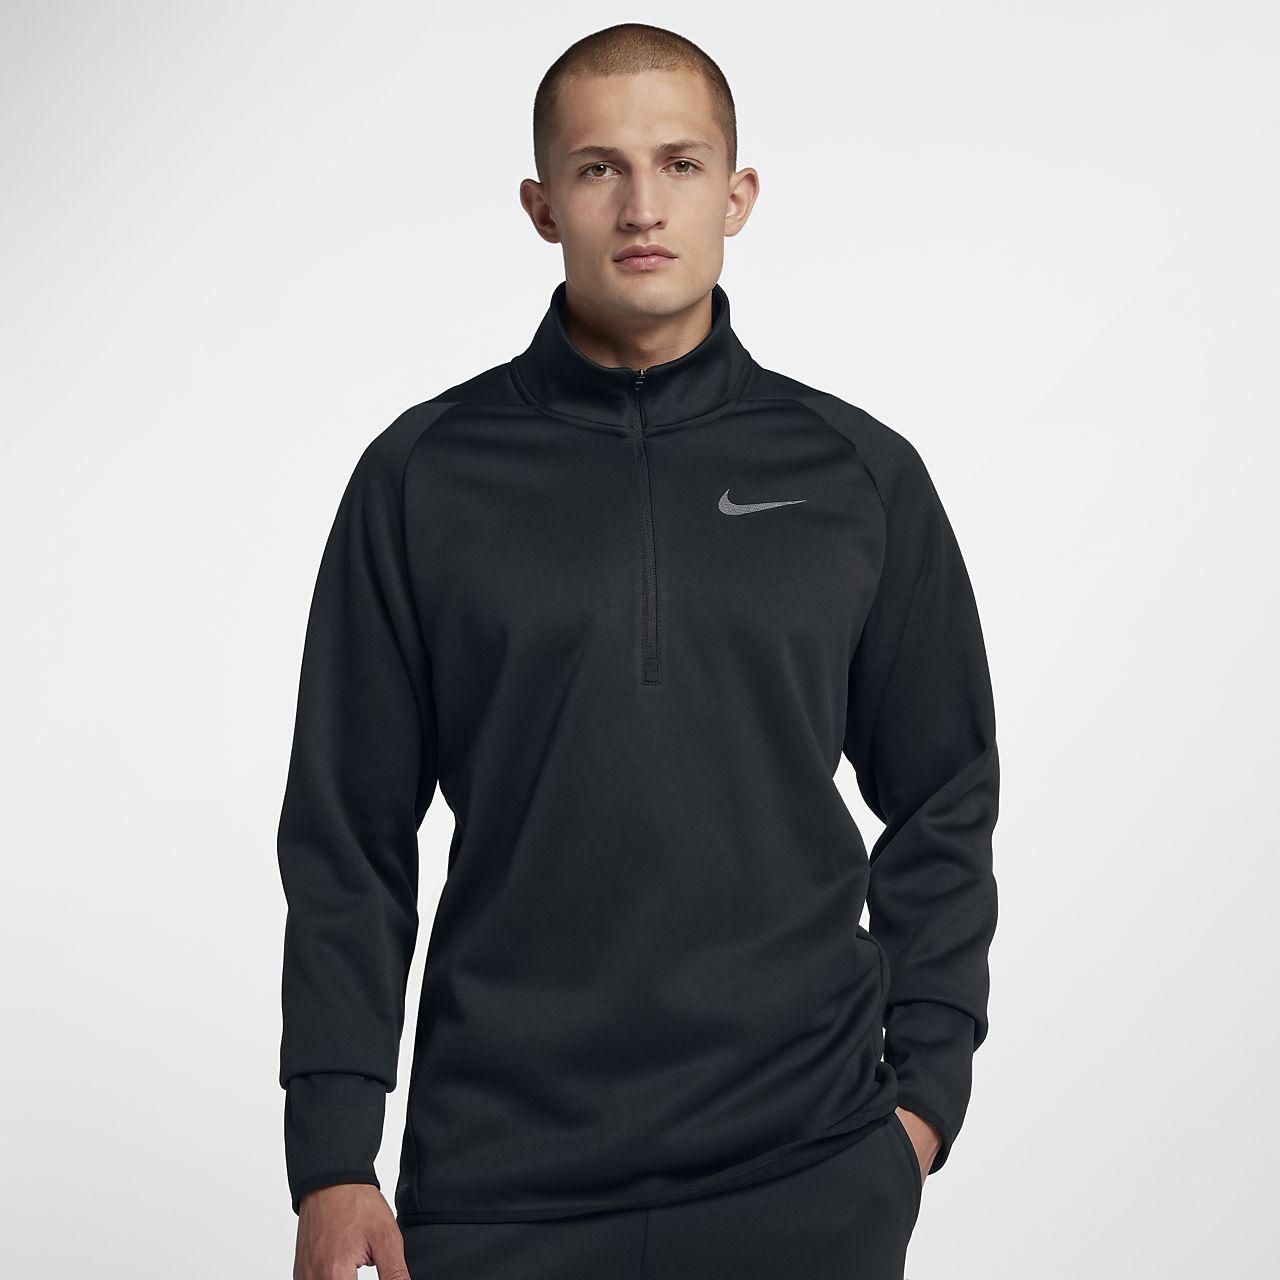 Nike Therma Men's Quarter-Zip Training Top